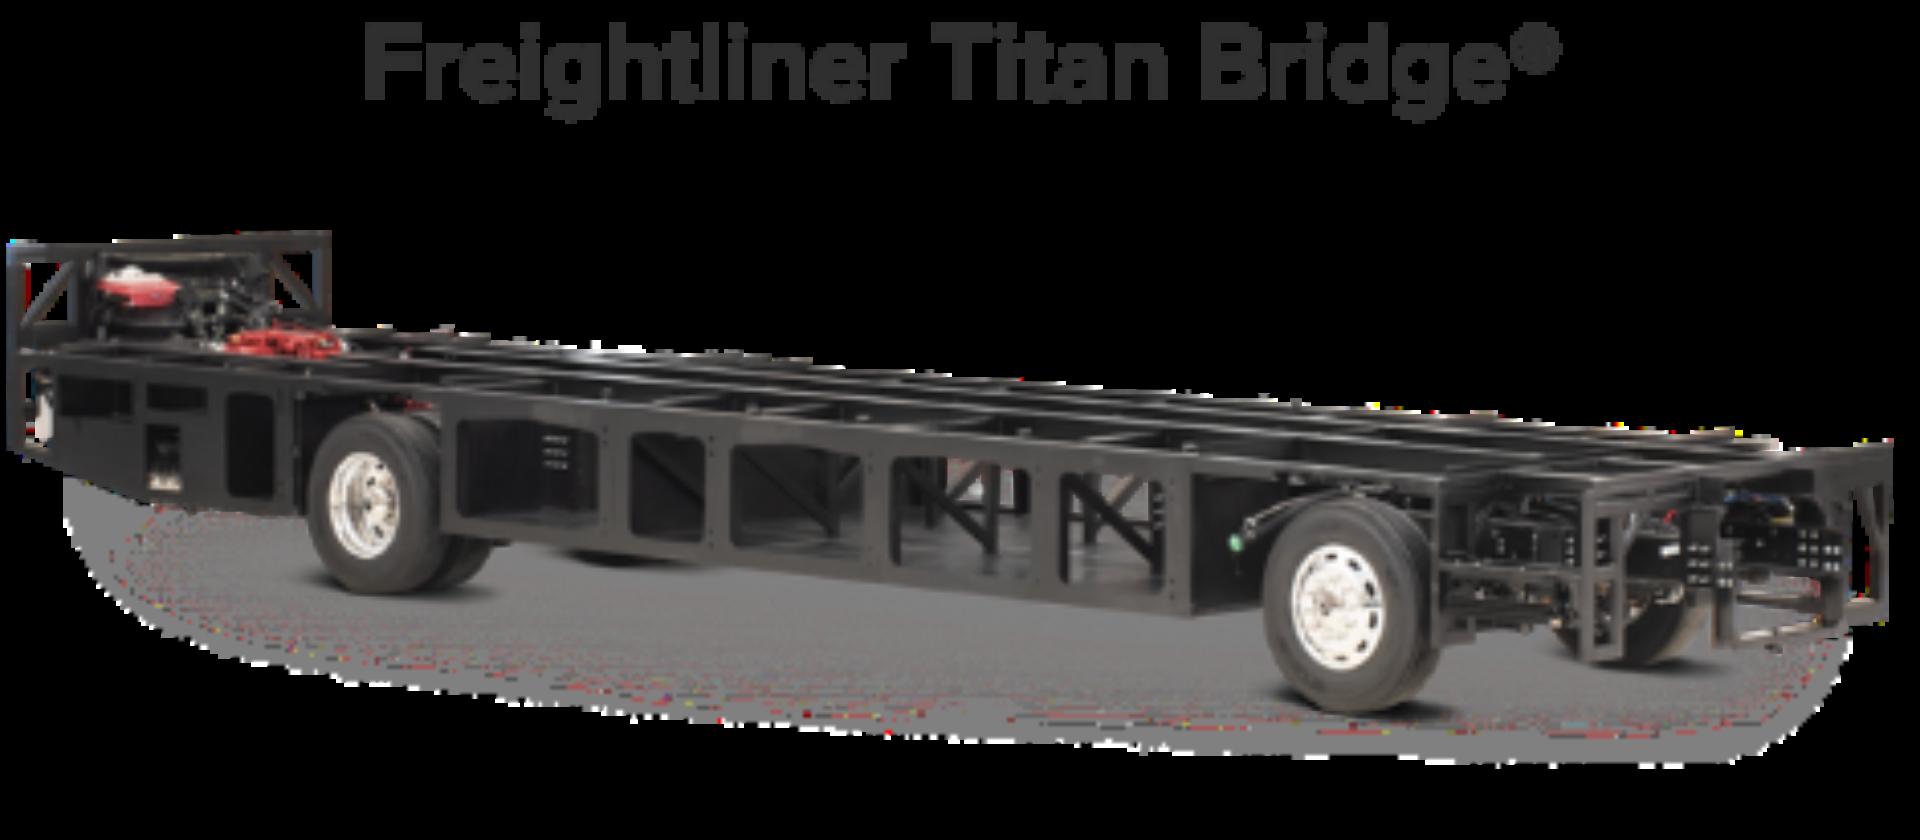 Freightliner titan bridge